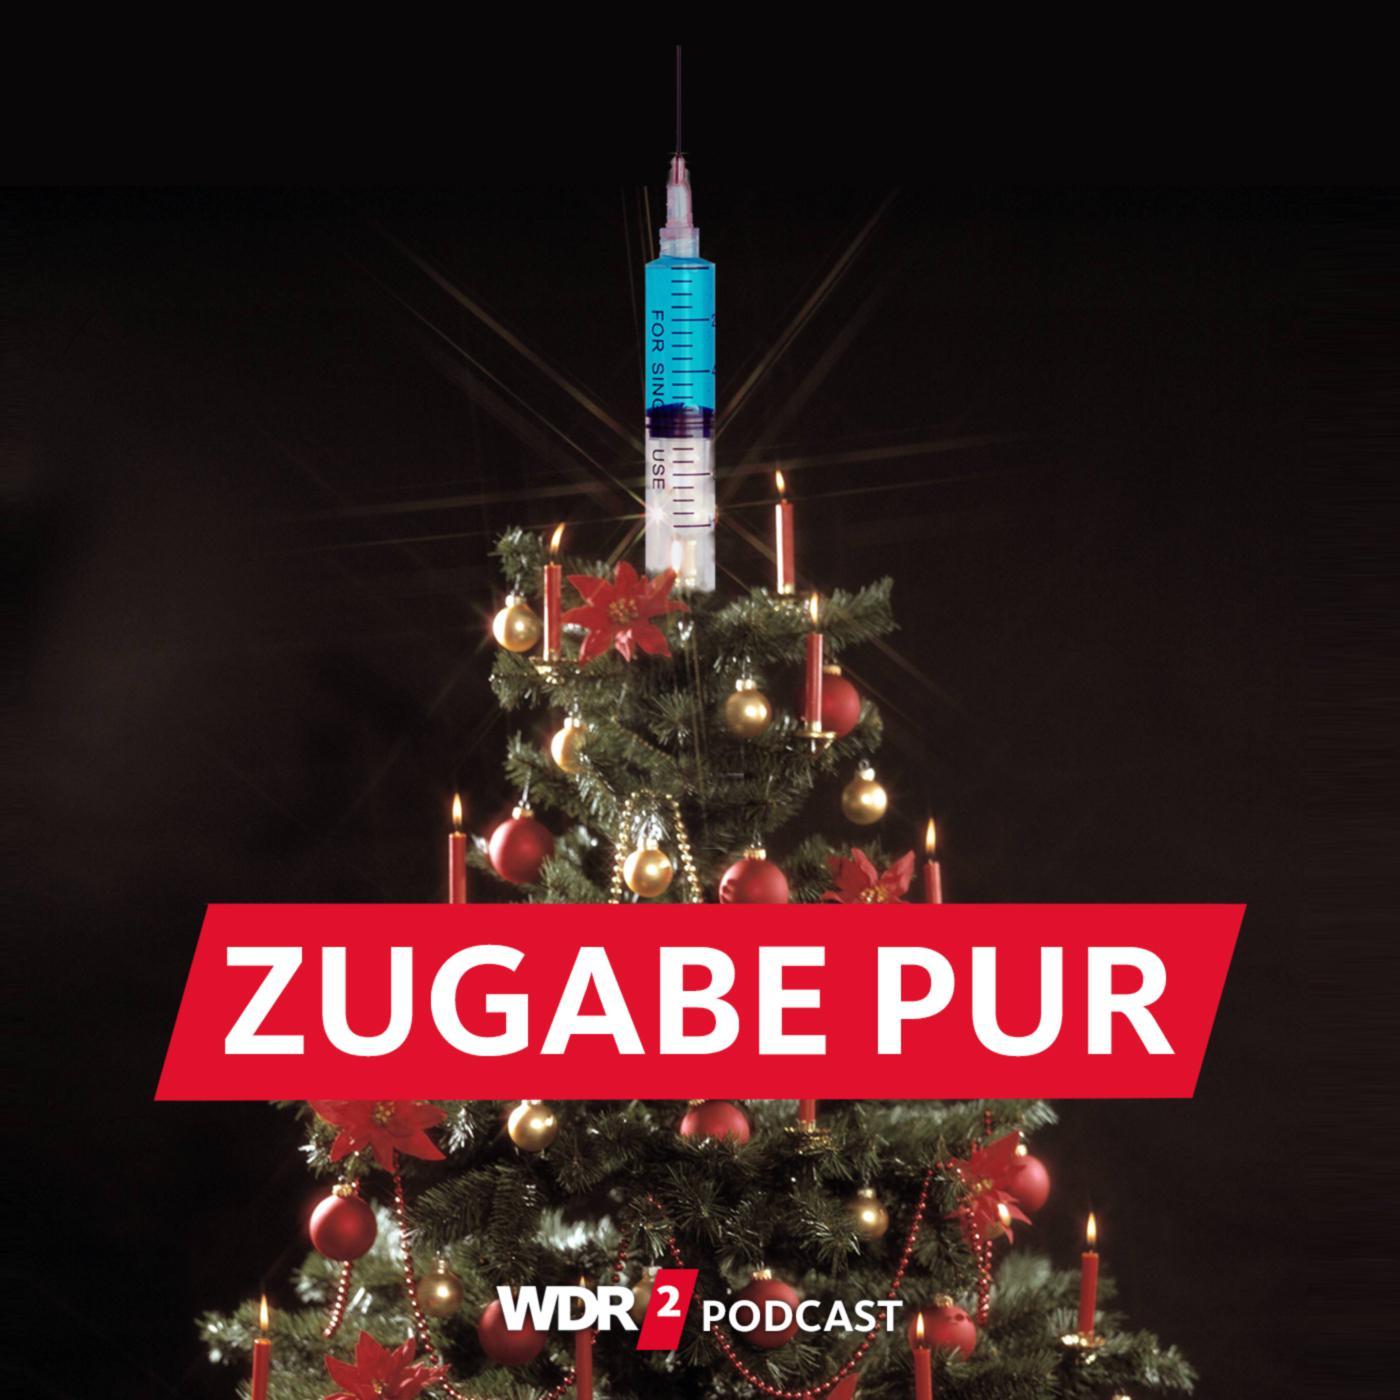 Wdr Zugabe